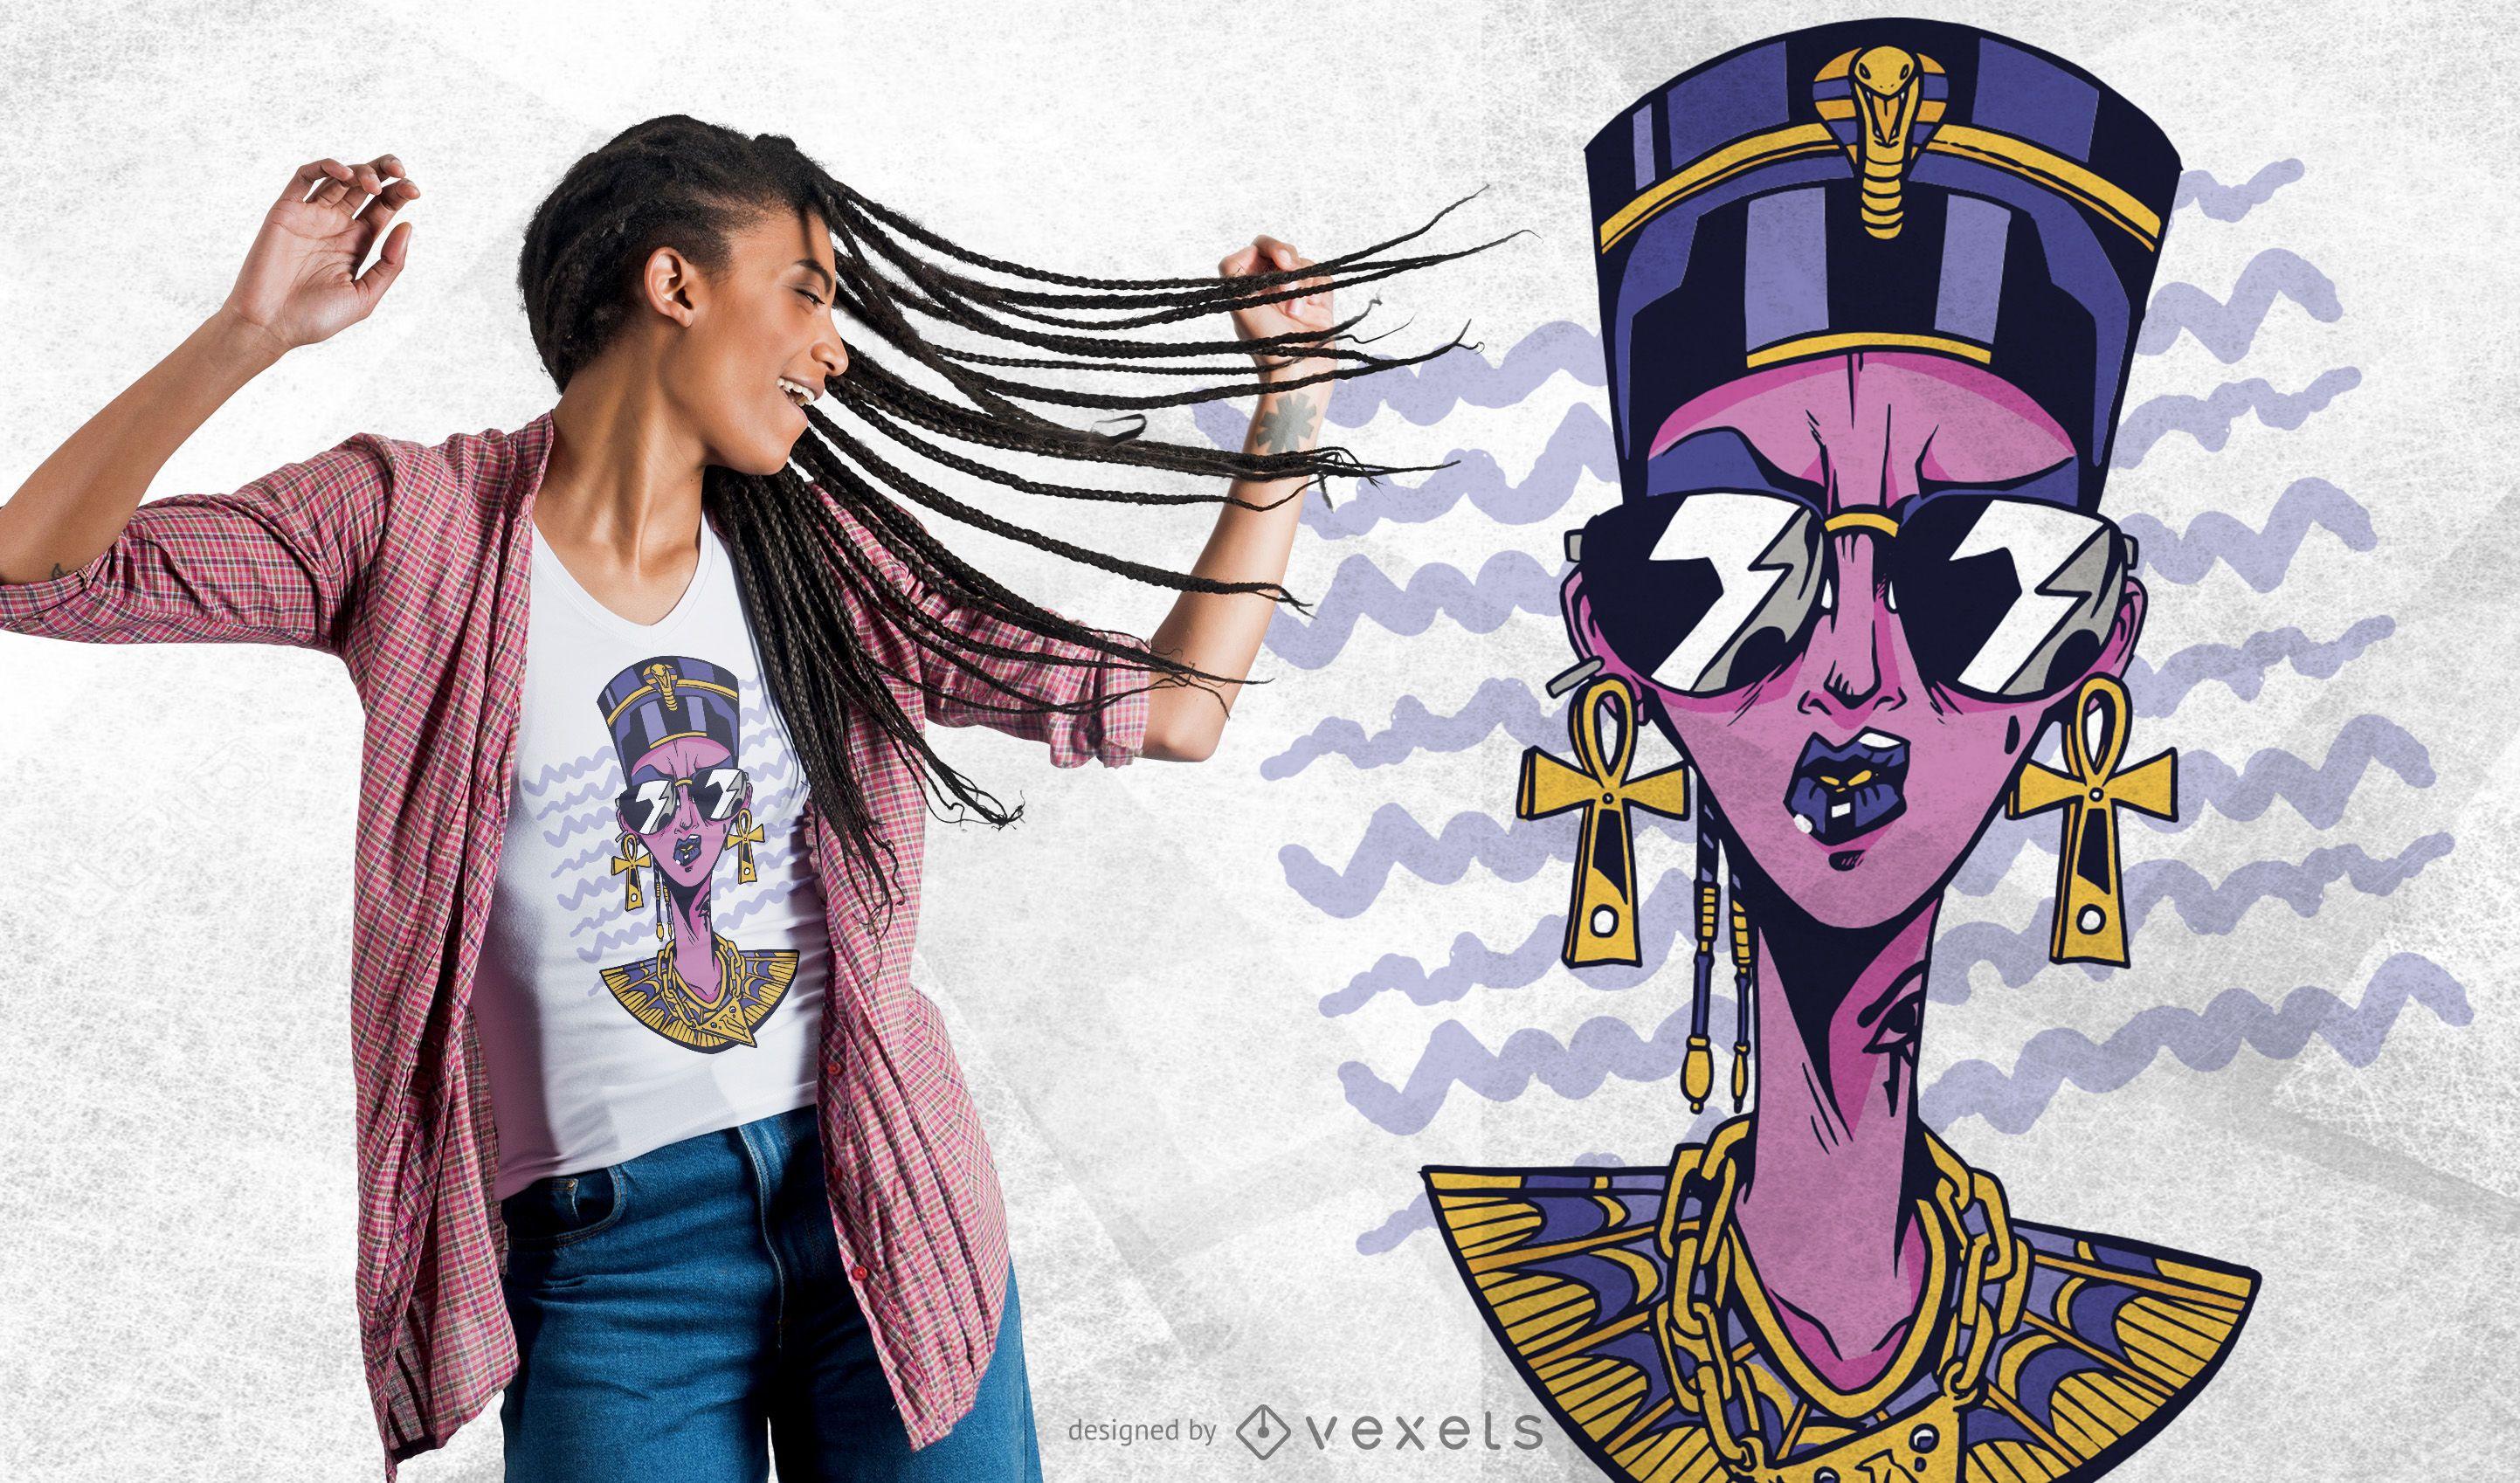 Cool Nefertiti t-shirt design